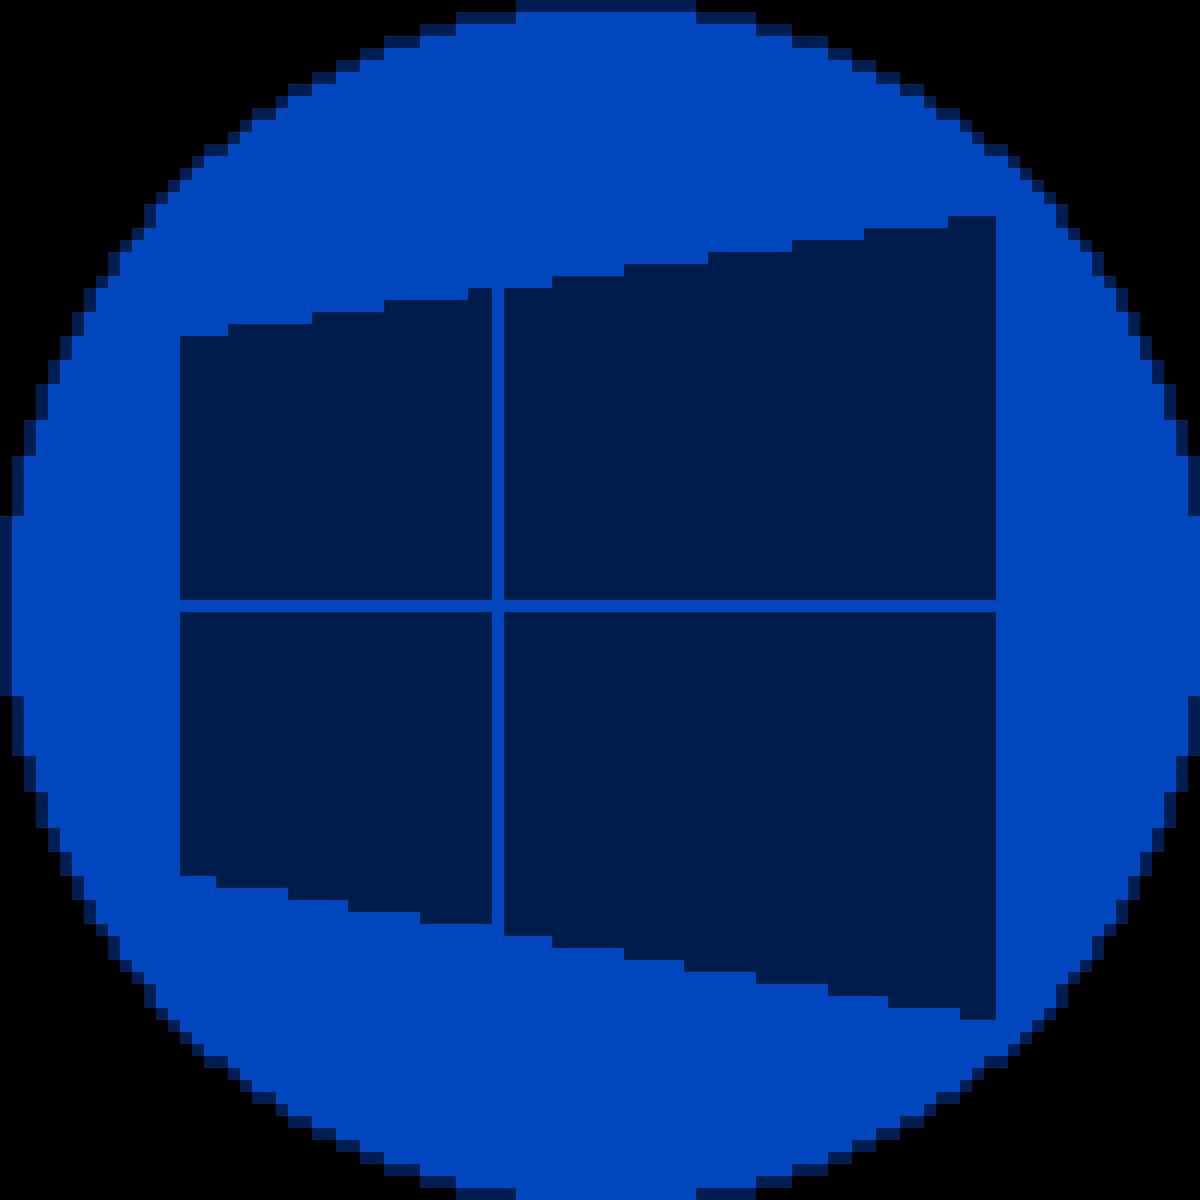 8-bit Windows Start Button by Derickalex